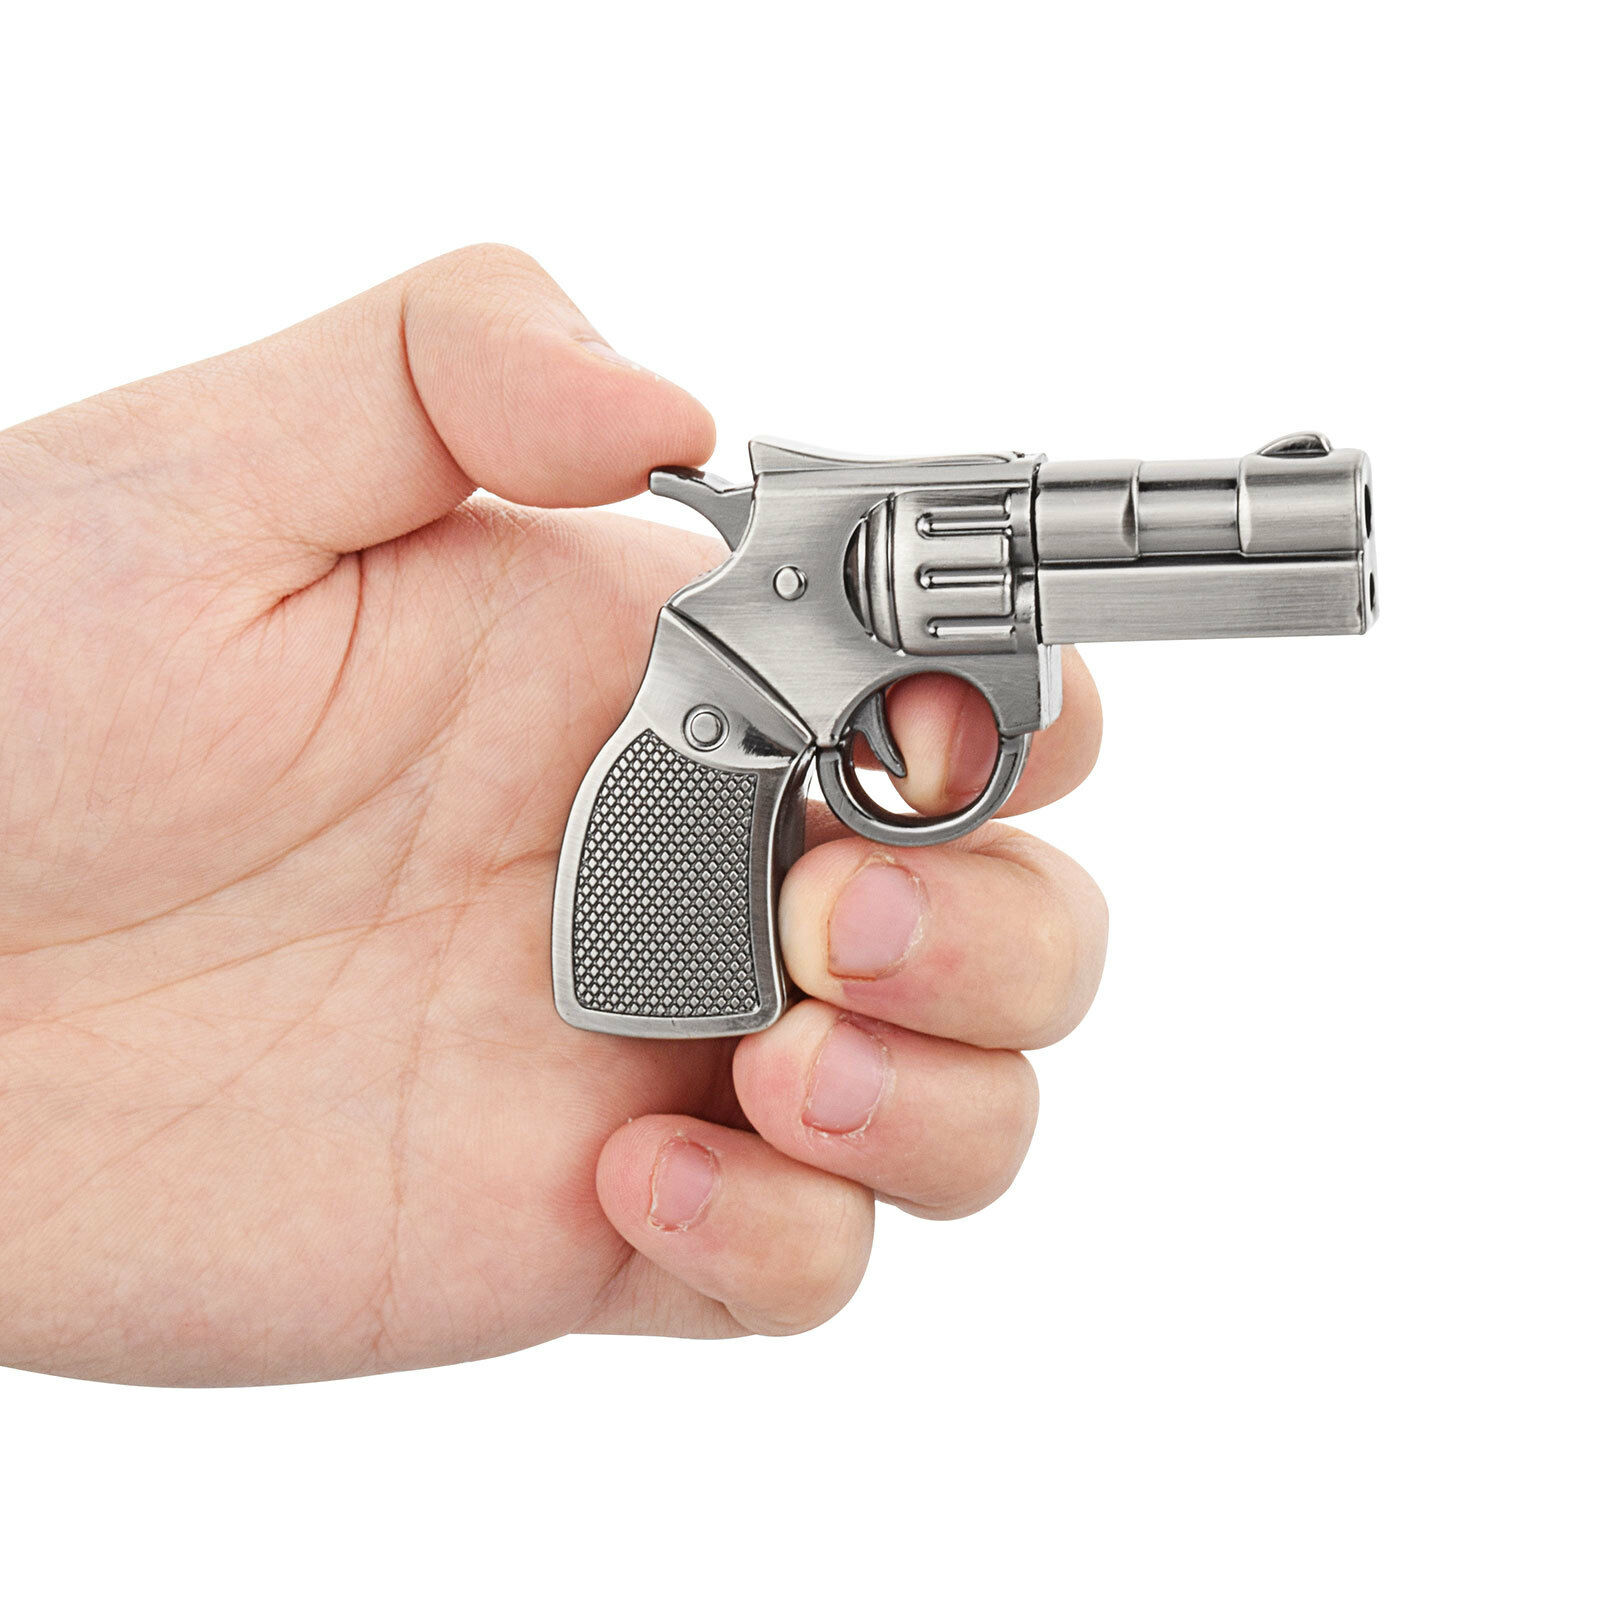 Silver Metal Gun Model 32GB USB 2.0 Flash Drives Memory Stic